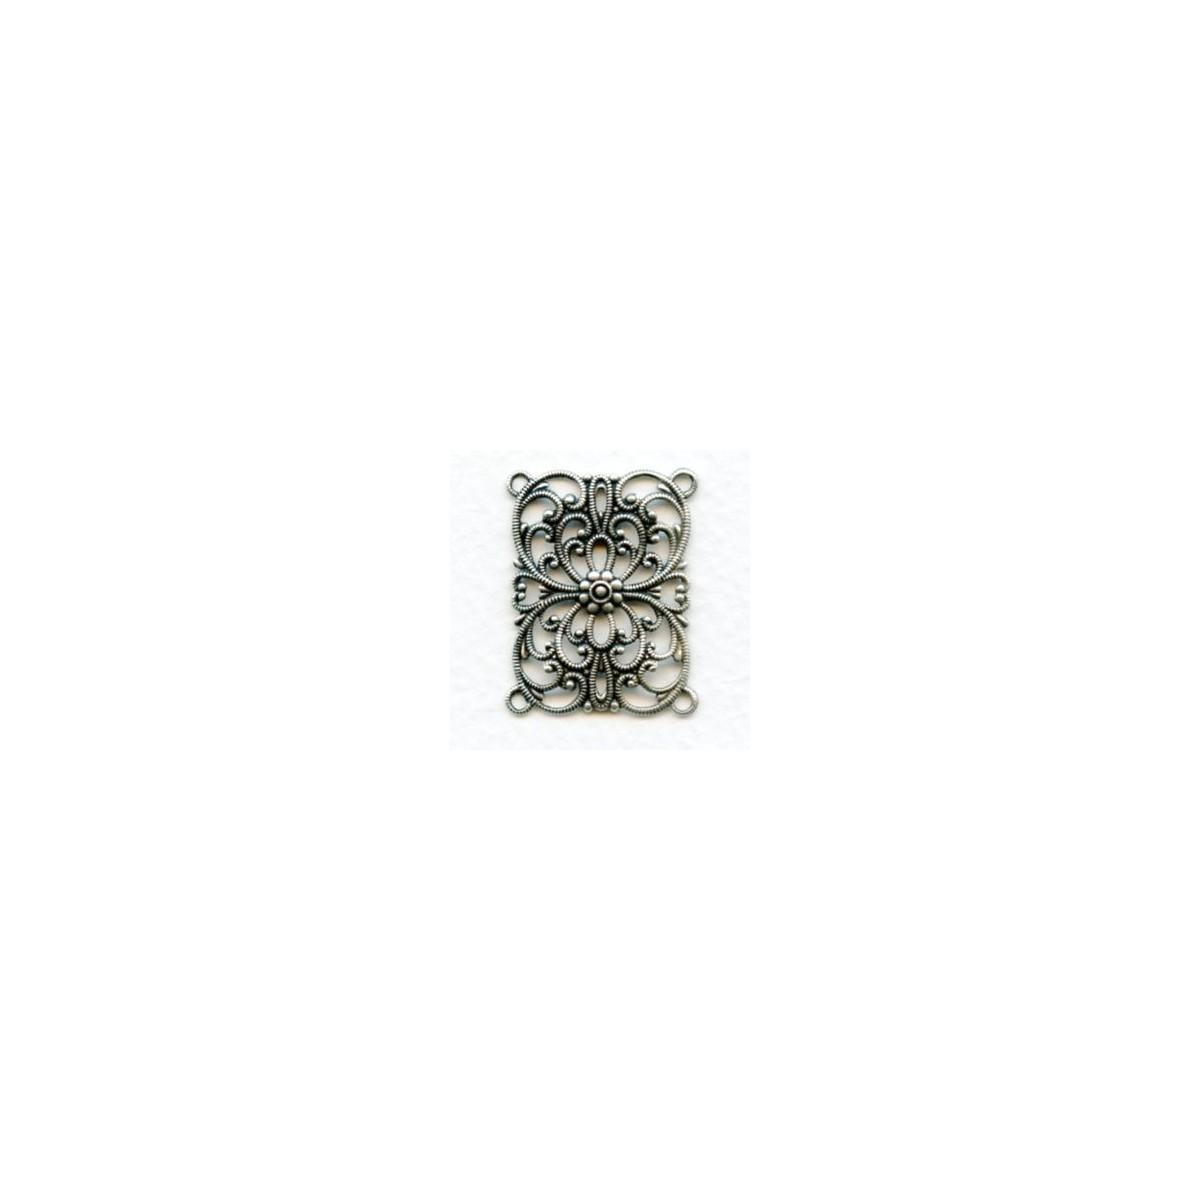 European Filigree Rectangle 28x22mm Oxidized Silver